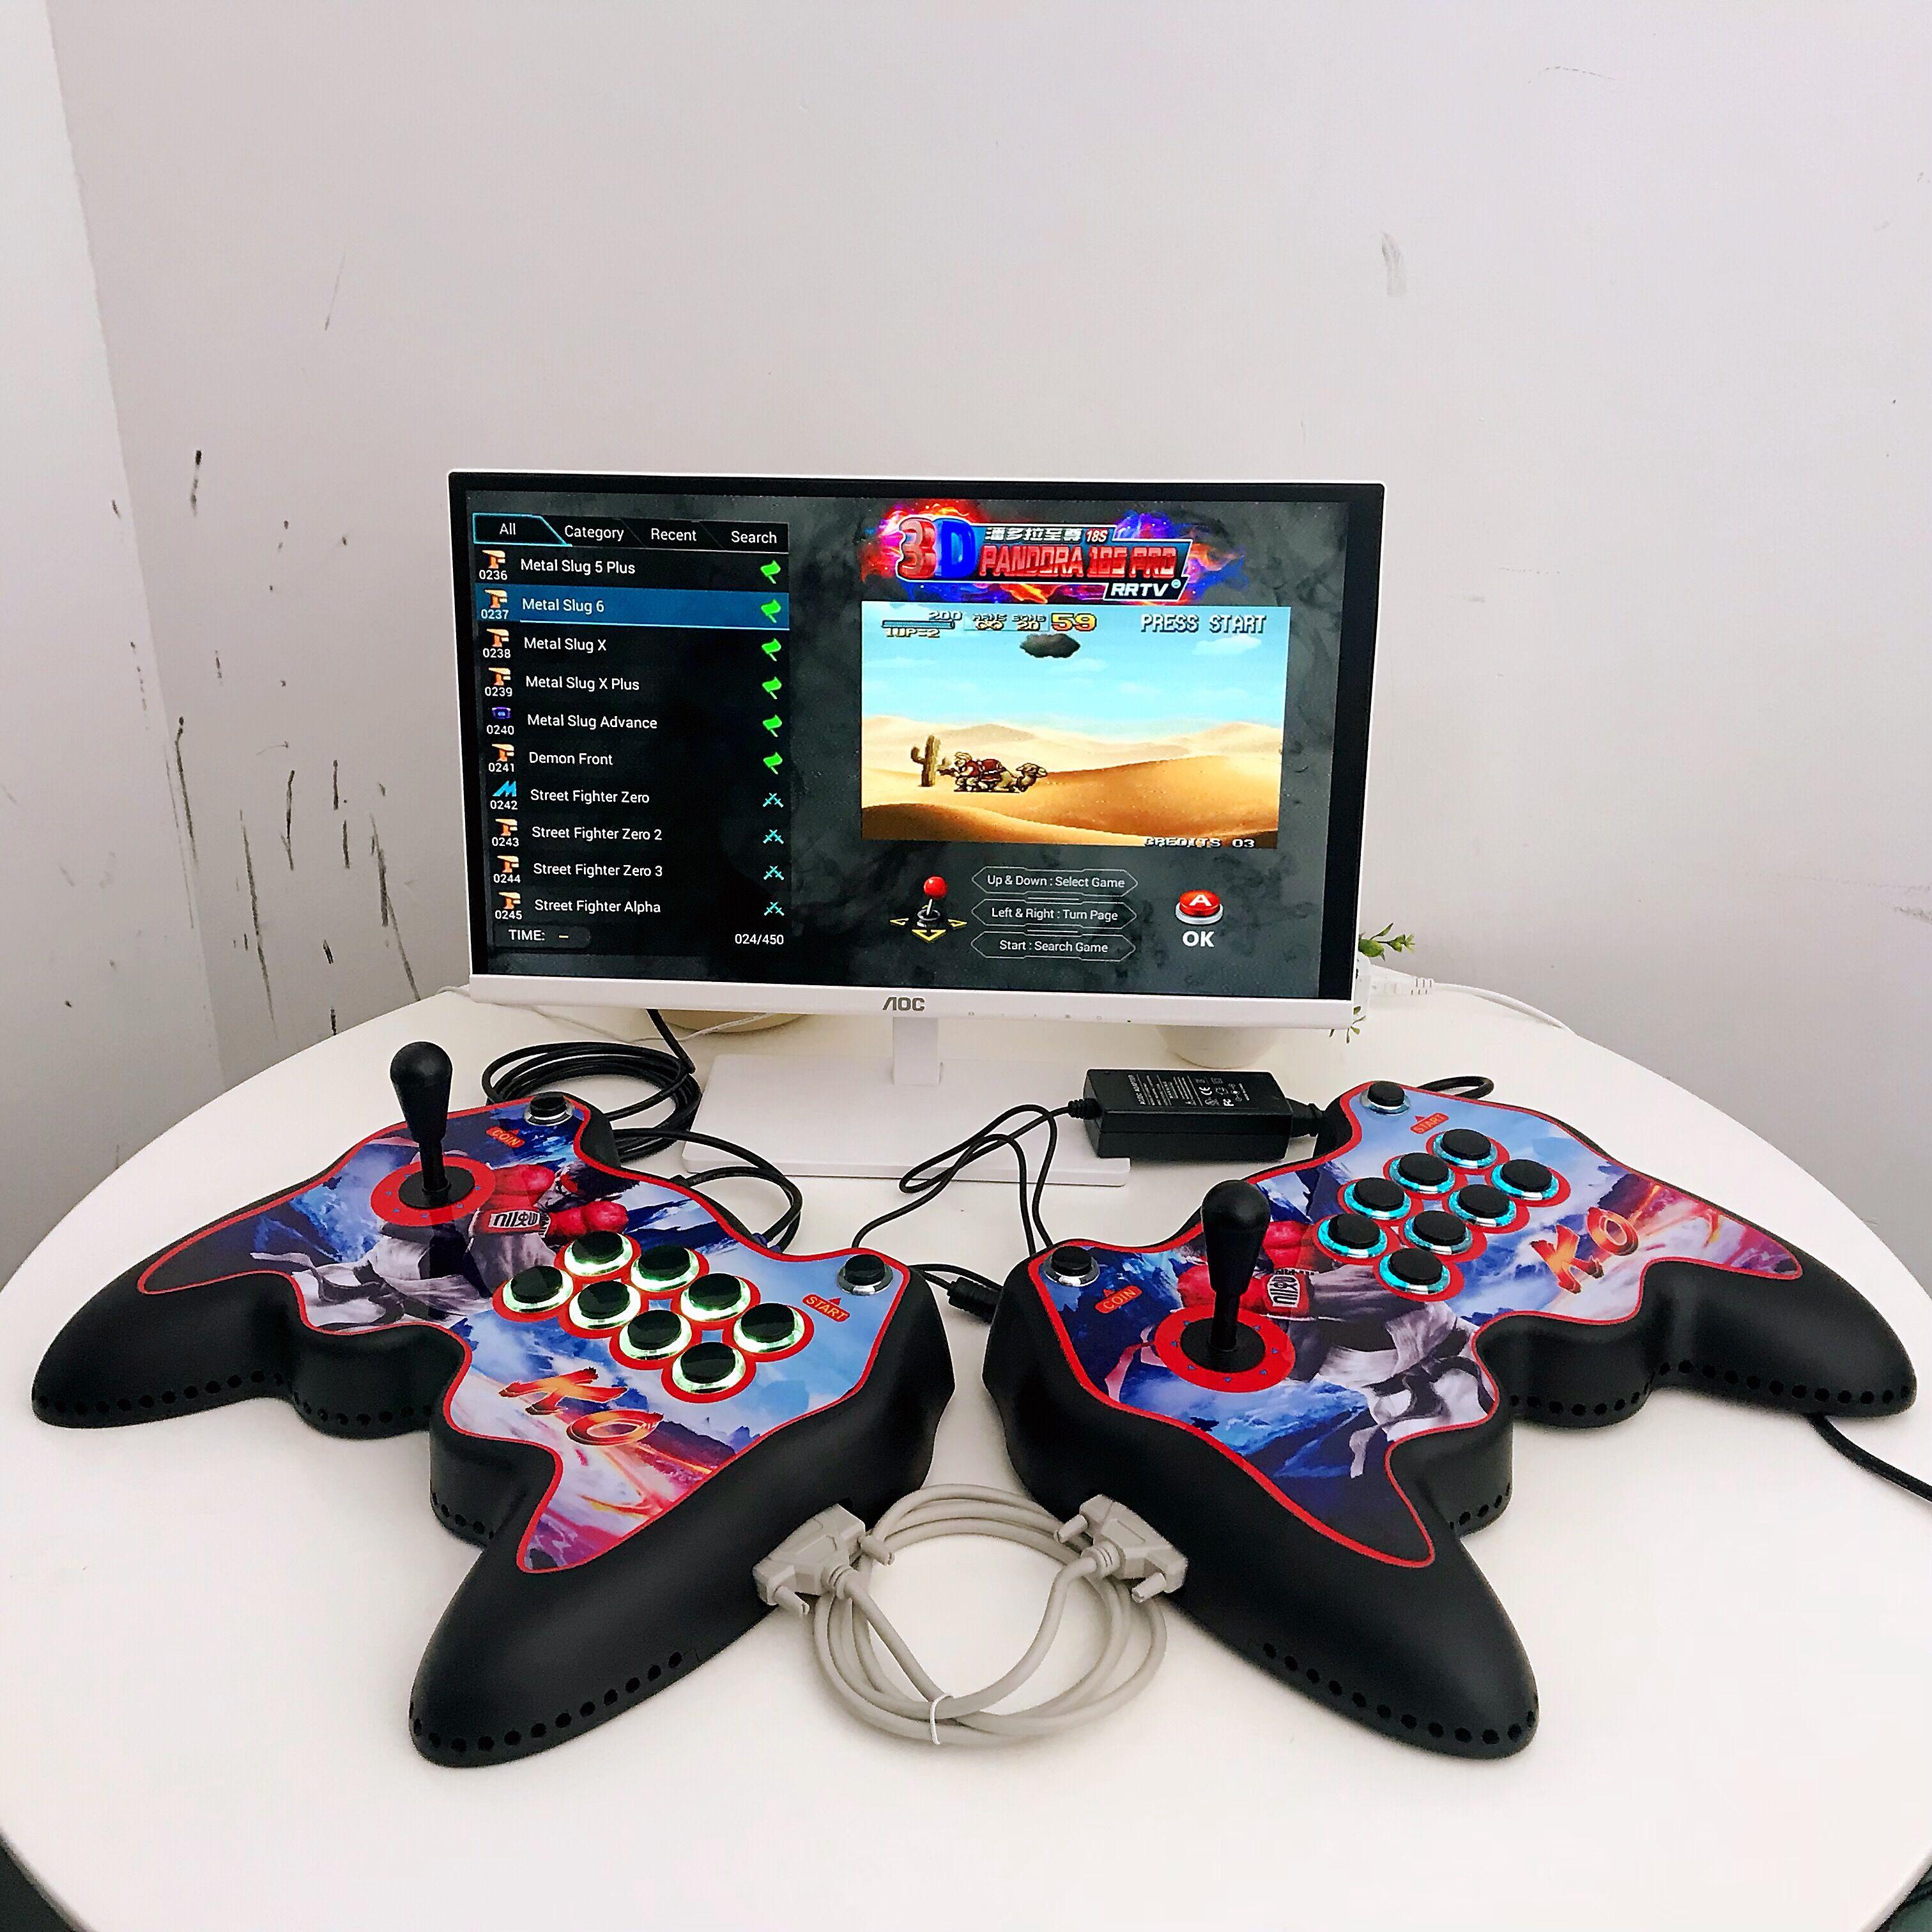 Joystick Shaped Pandora Box 18S Pro 8000 Games Console (WiFi Version)